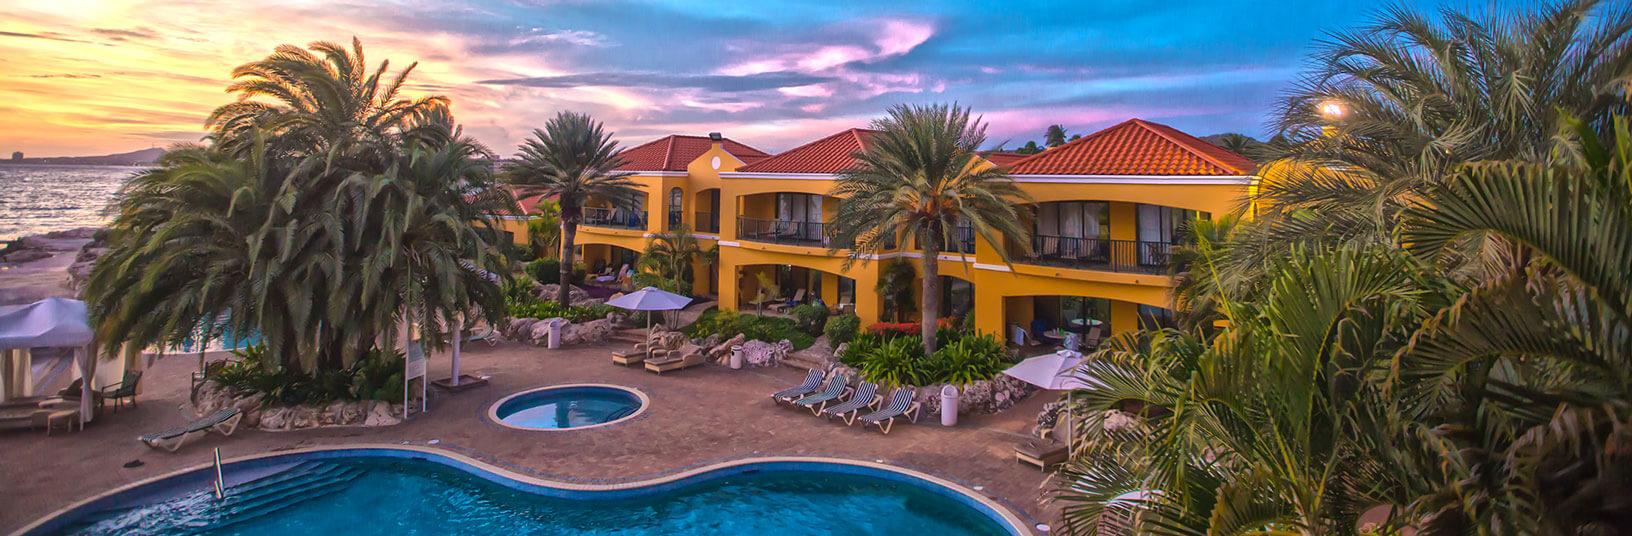 The Royal Sea Aquarium Resort in Curacao | Royal Reservations